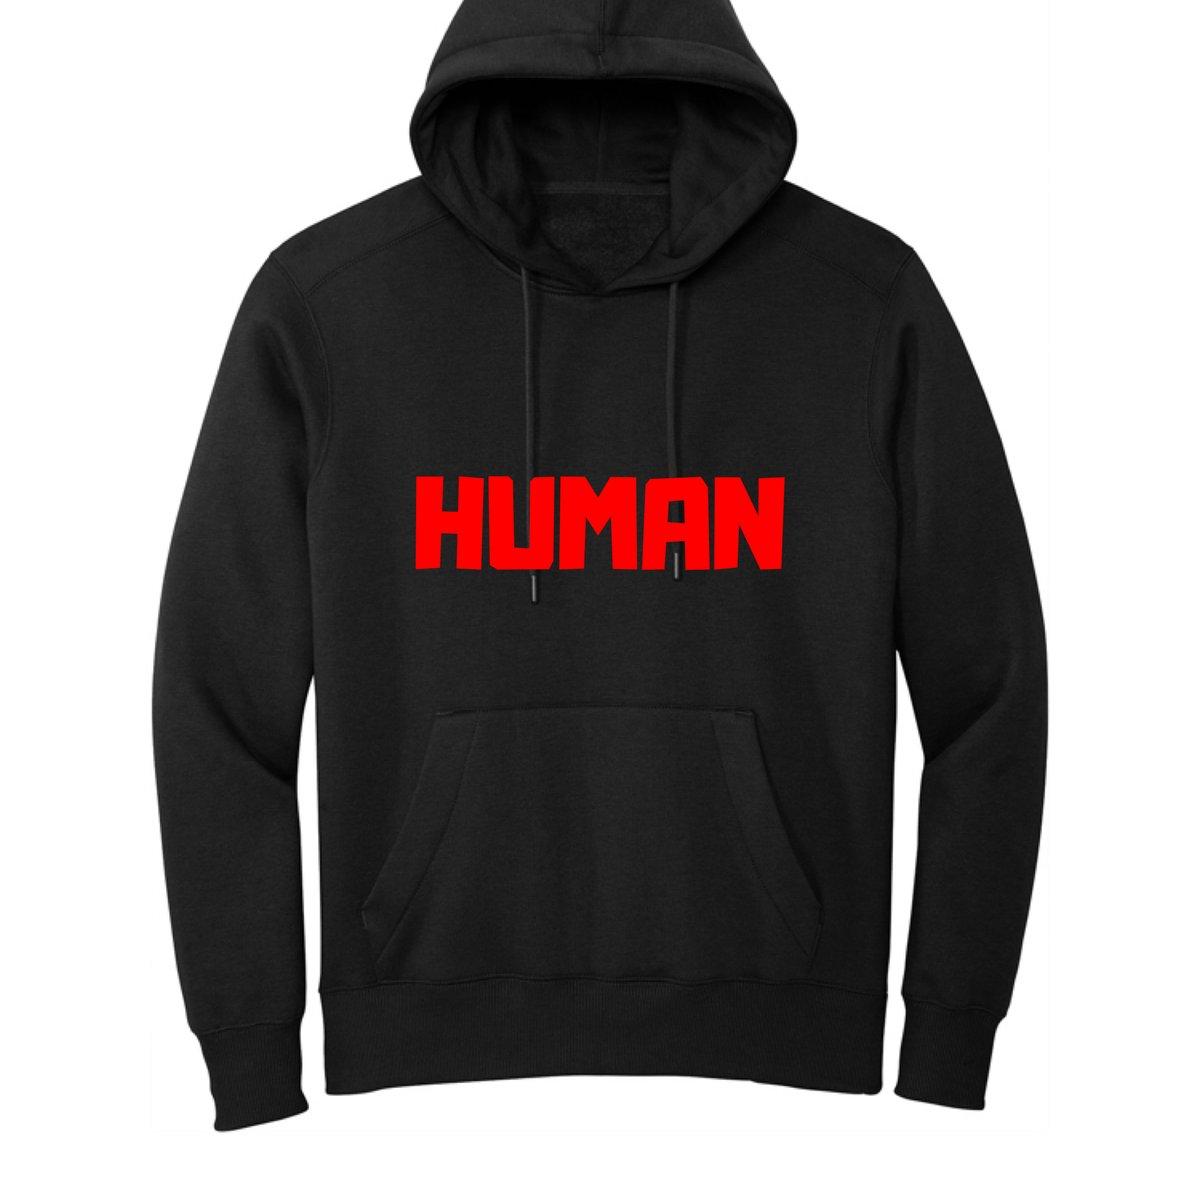 Image of Black Human Hoodie | Red Text